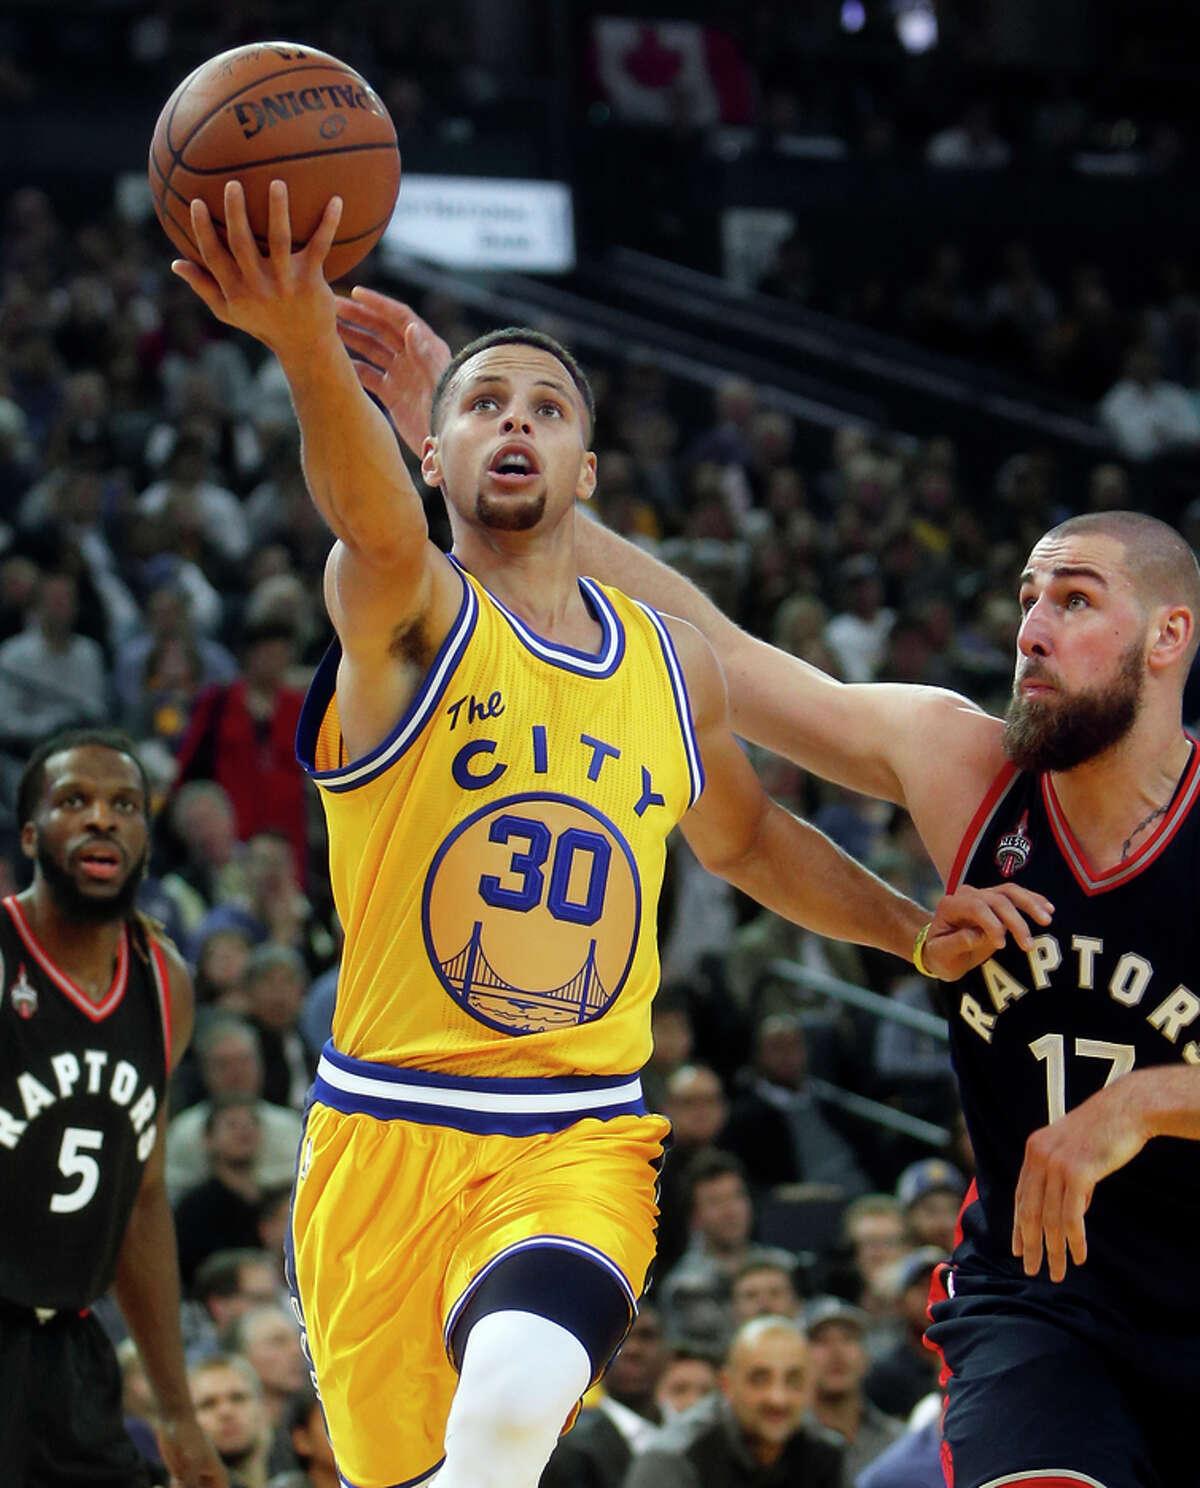 Warriors guard Stephen Curry scores past Toronto center Jonas Valanciunas in the second quarter.